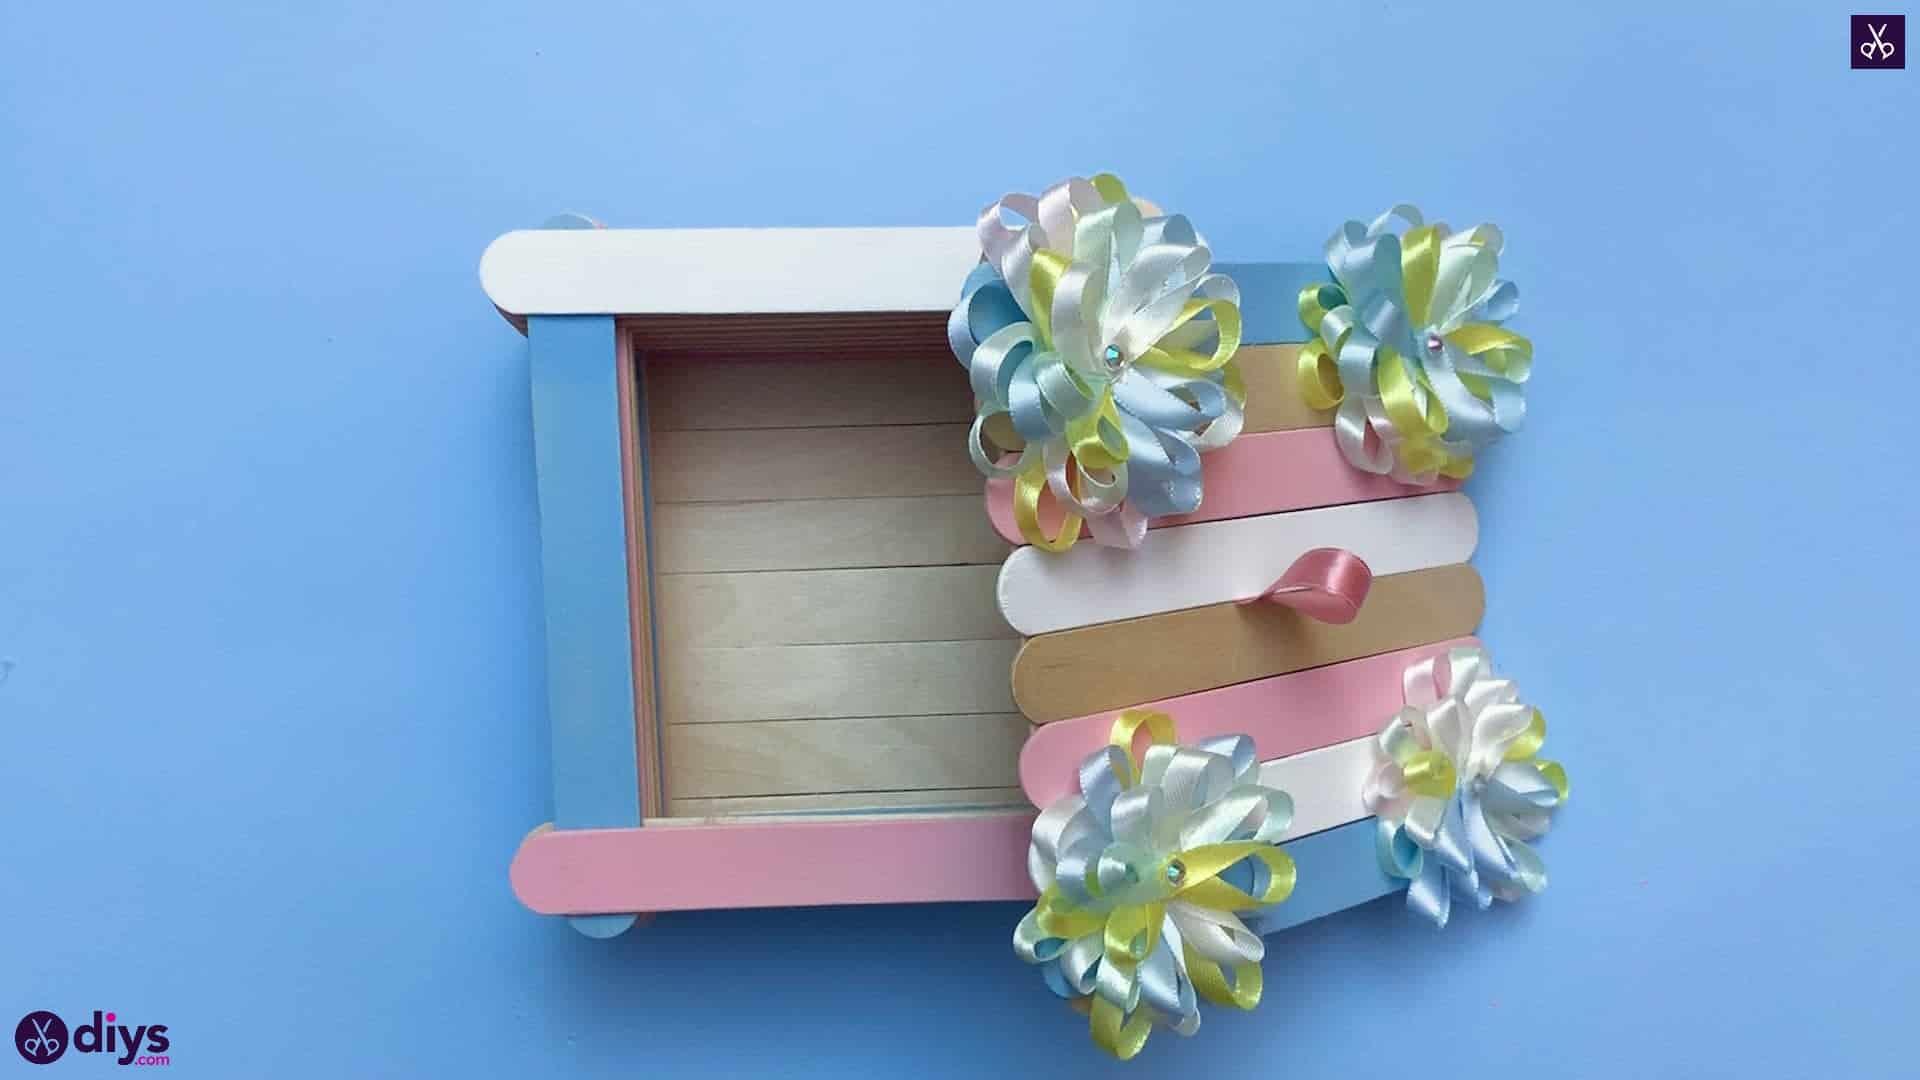 Diy popsicle stick jewelry box top